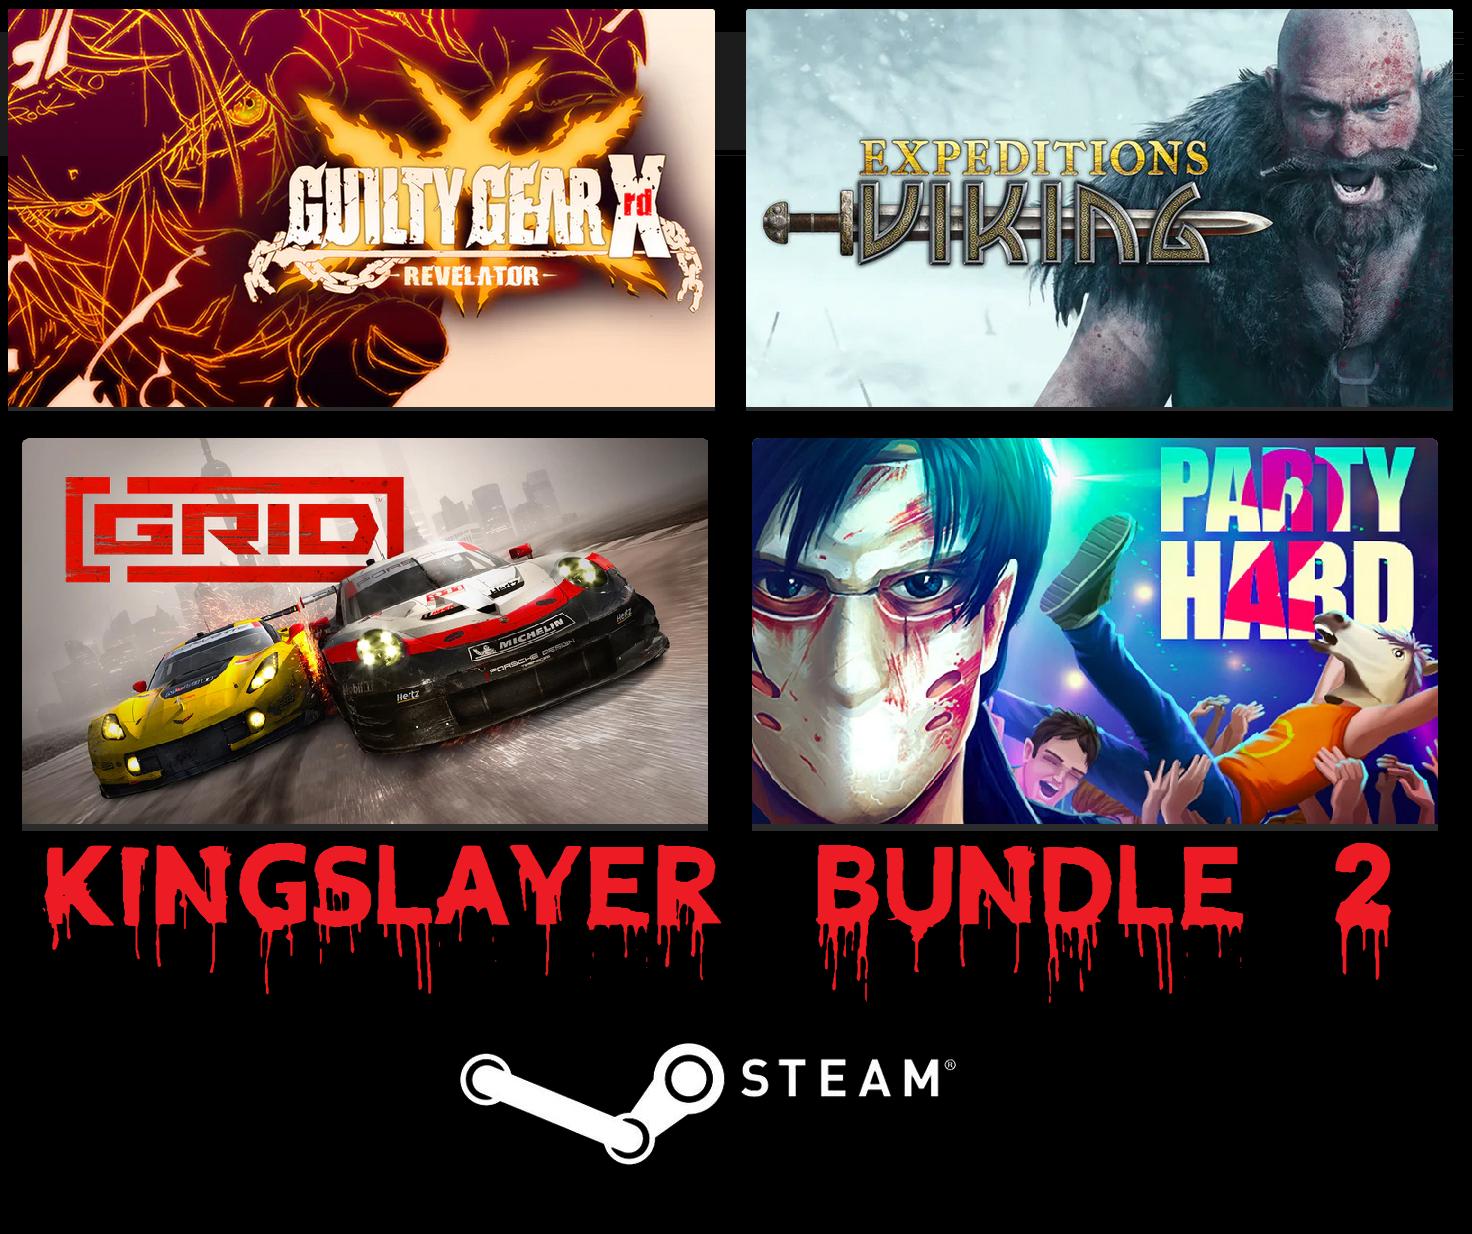 Pakiet 5 gier (GRID, Duke Nukem, Party Hard i inne + DLC) (PC) - Kingslayer Bundle